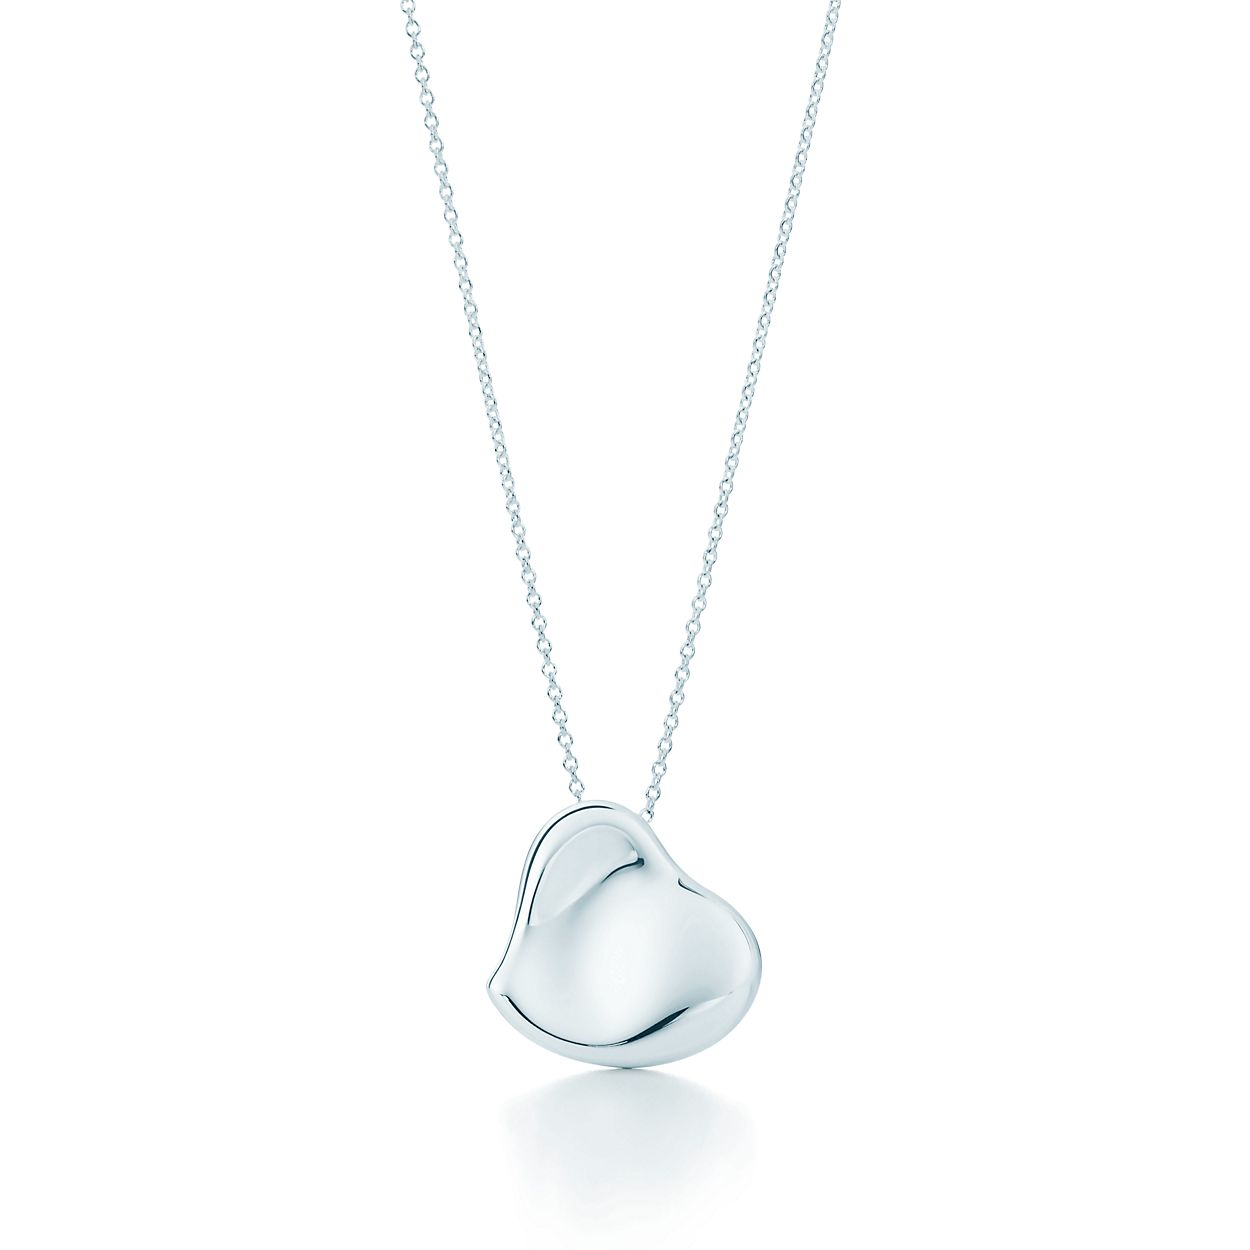 Elsa peretti full heart pendant in sterling silver 20 mm wide elsa perettifull heart pendant aloadofball Gallery